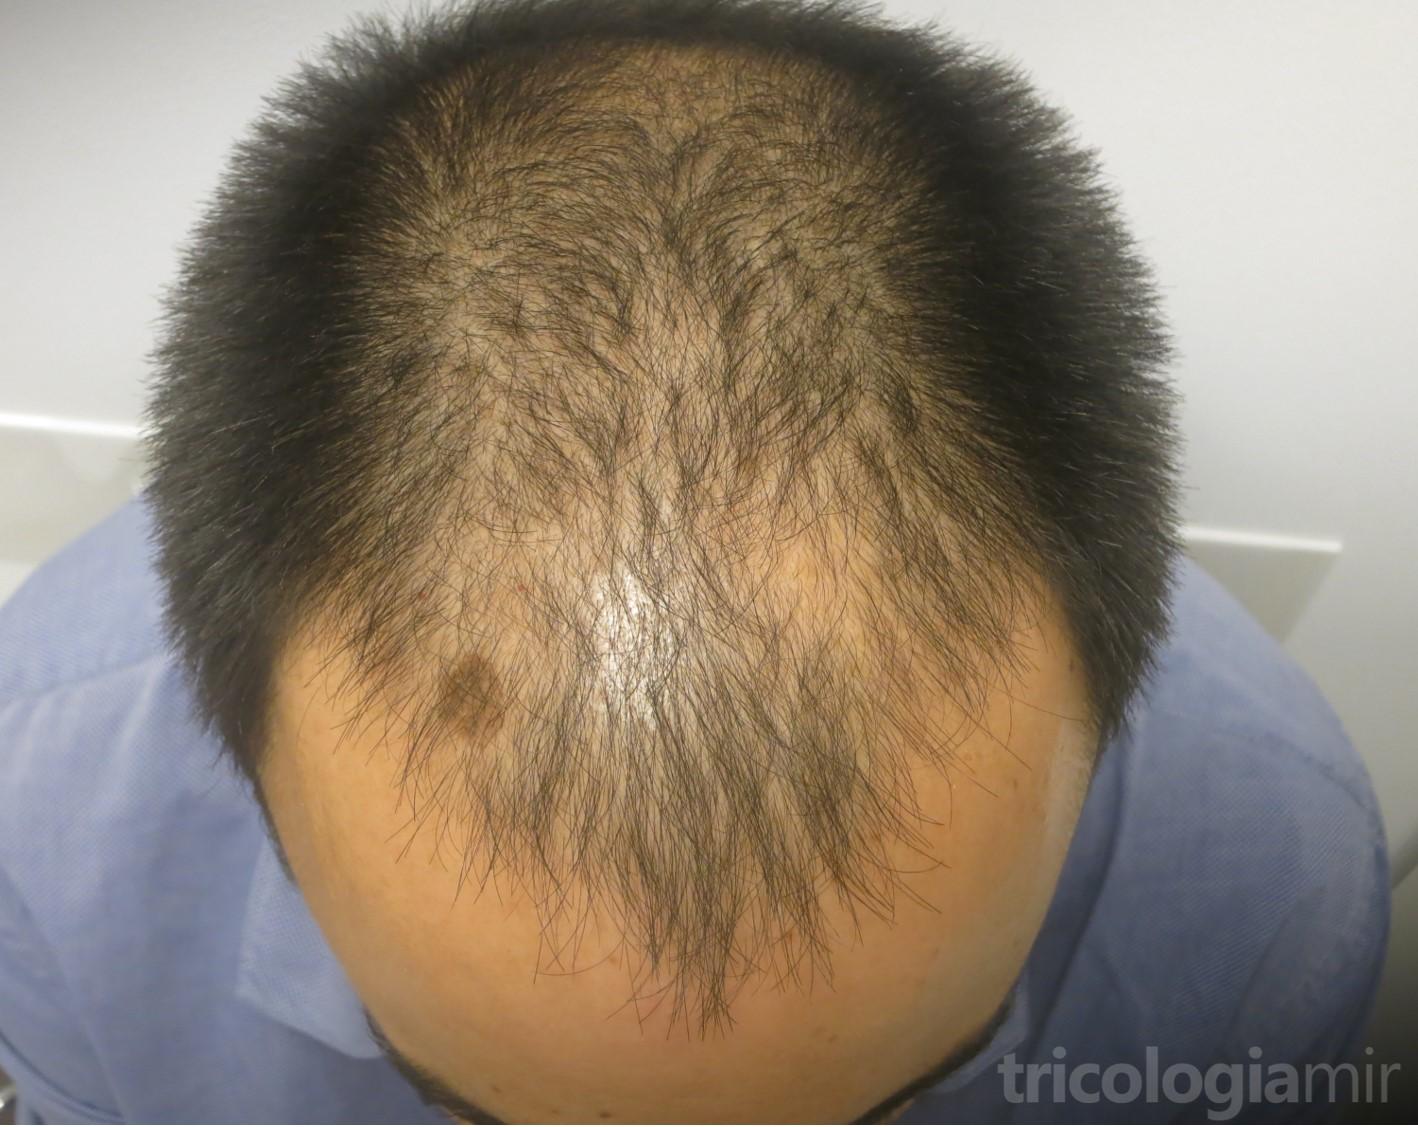 MAGA grado IV antes de realizar tratamiento